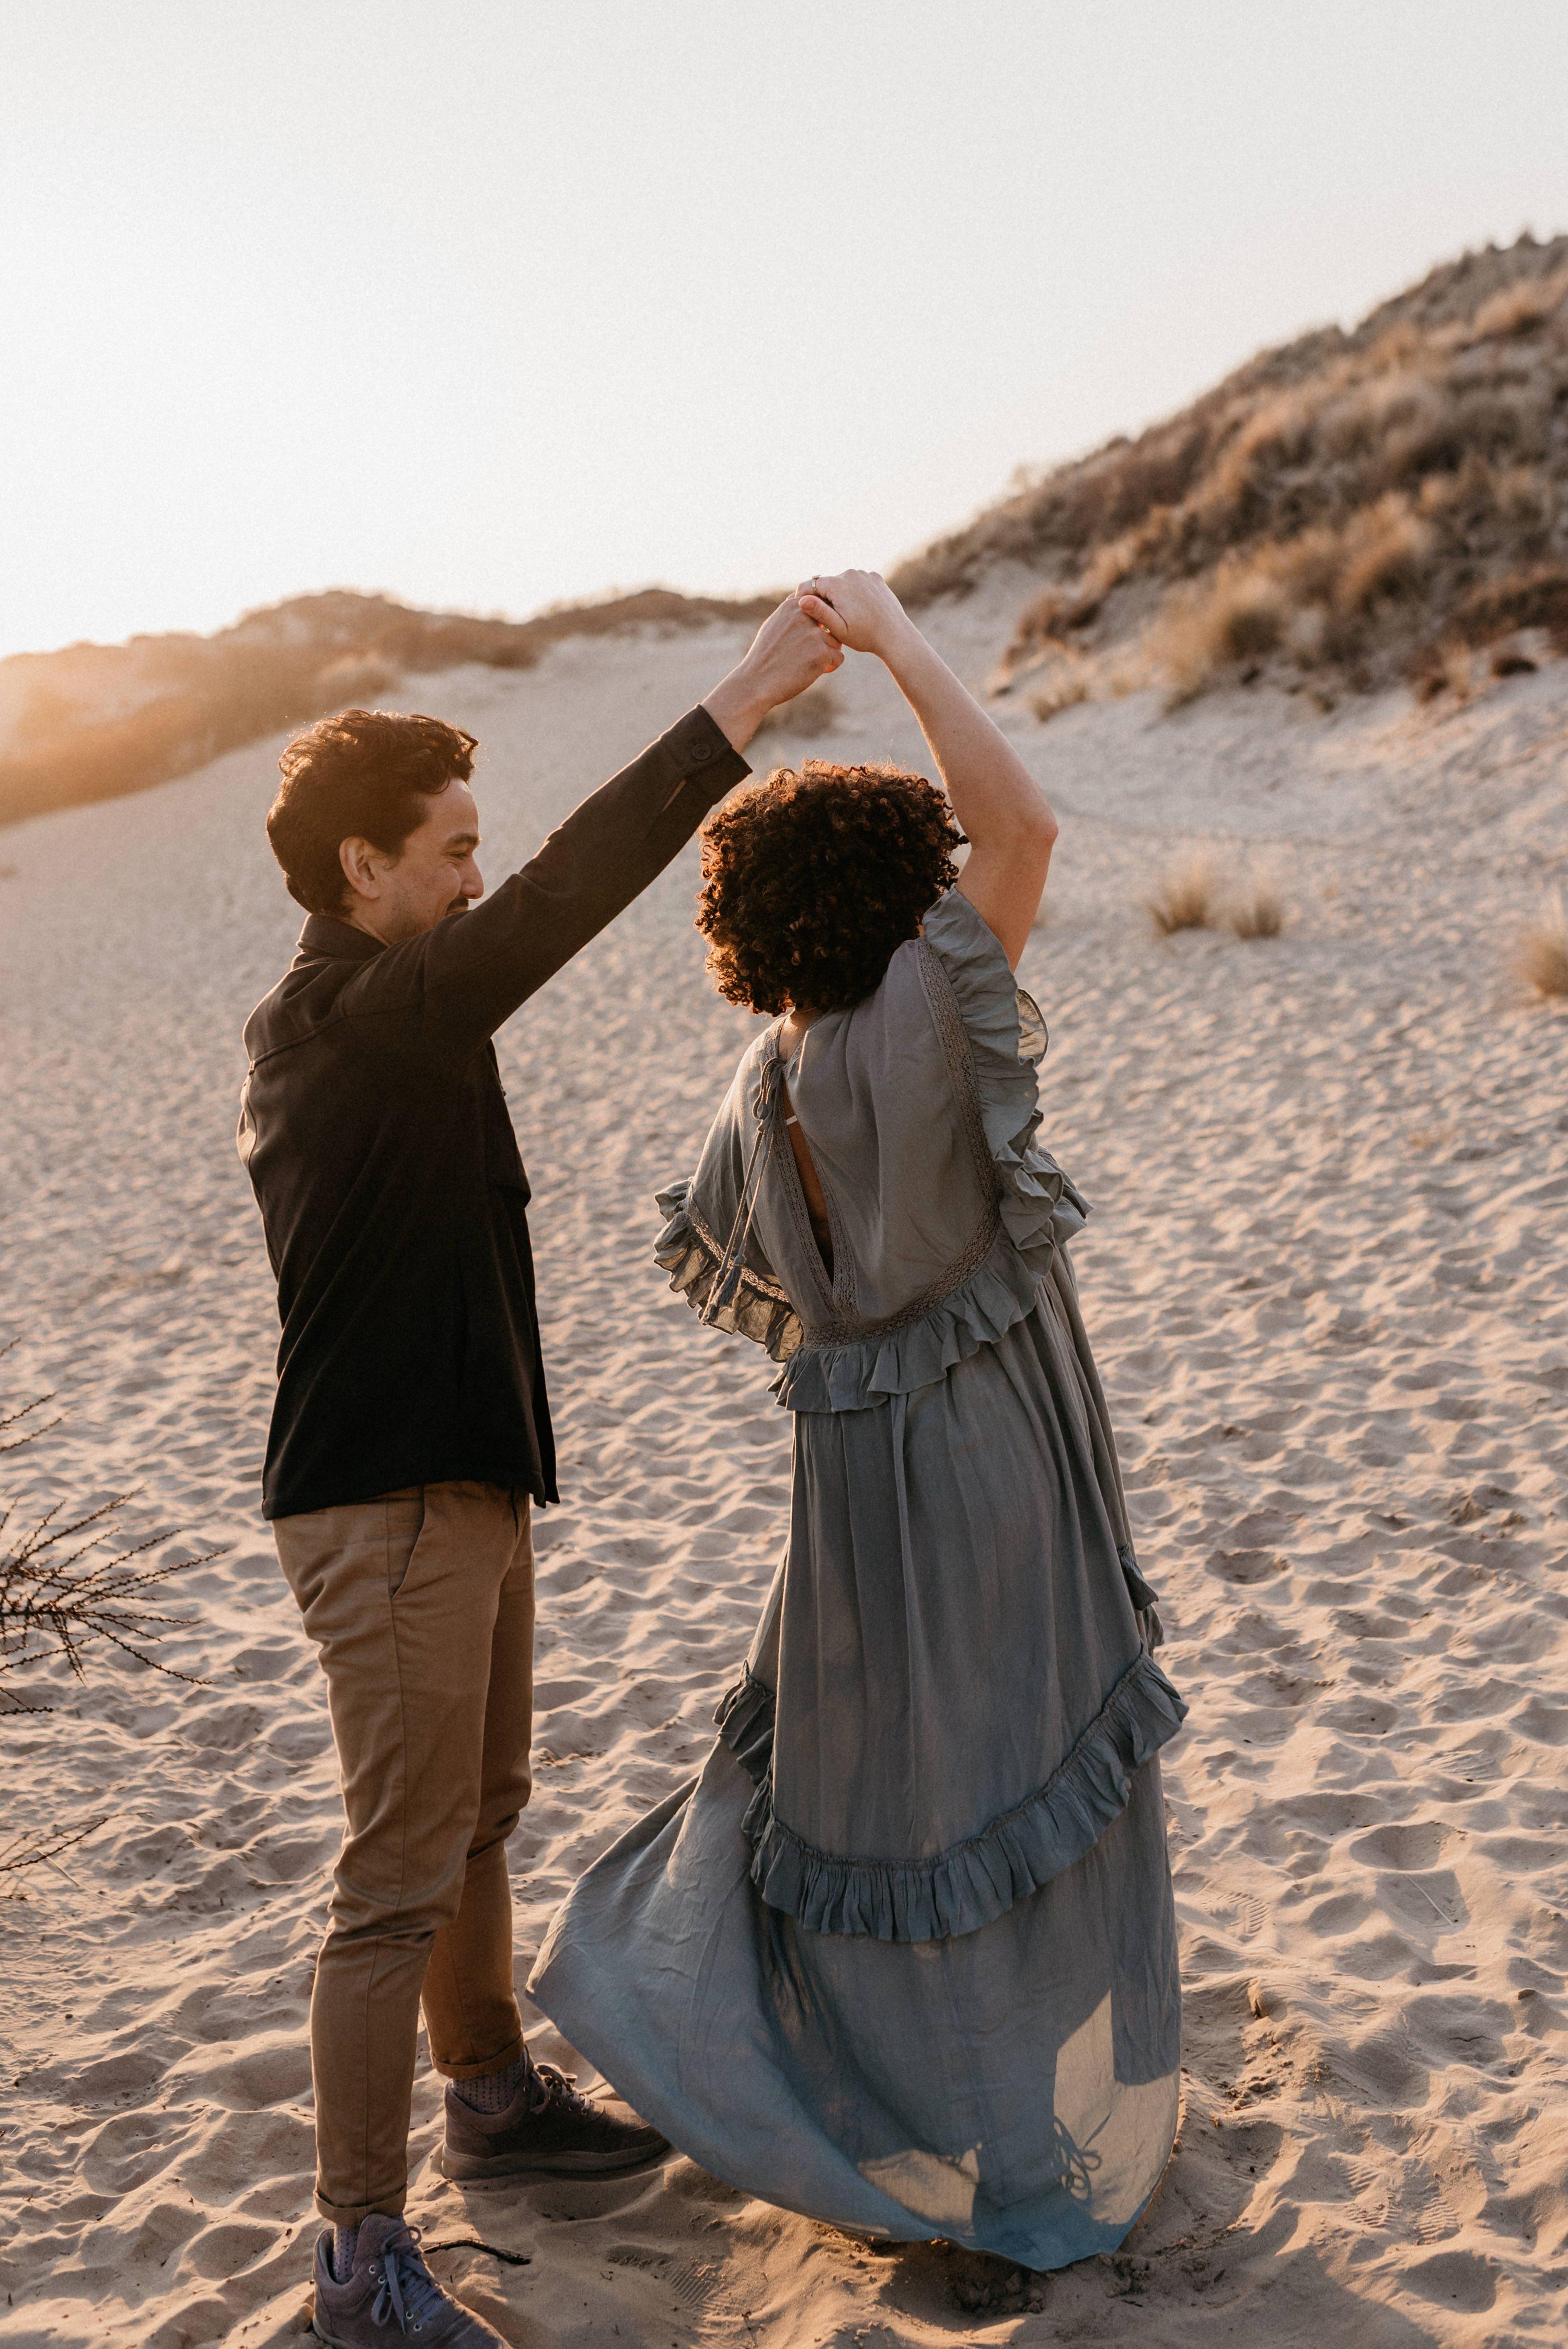 den haag,duinen den haag,golden hour,fotoshoot den haag,fotoshoot duinen den haag,zwangerschap,zwangerschapshoot,zwnagerschapshoot den haag